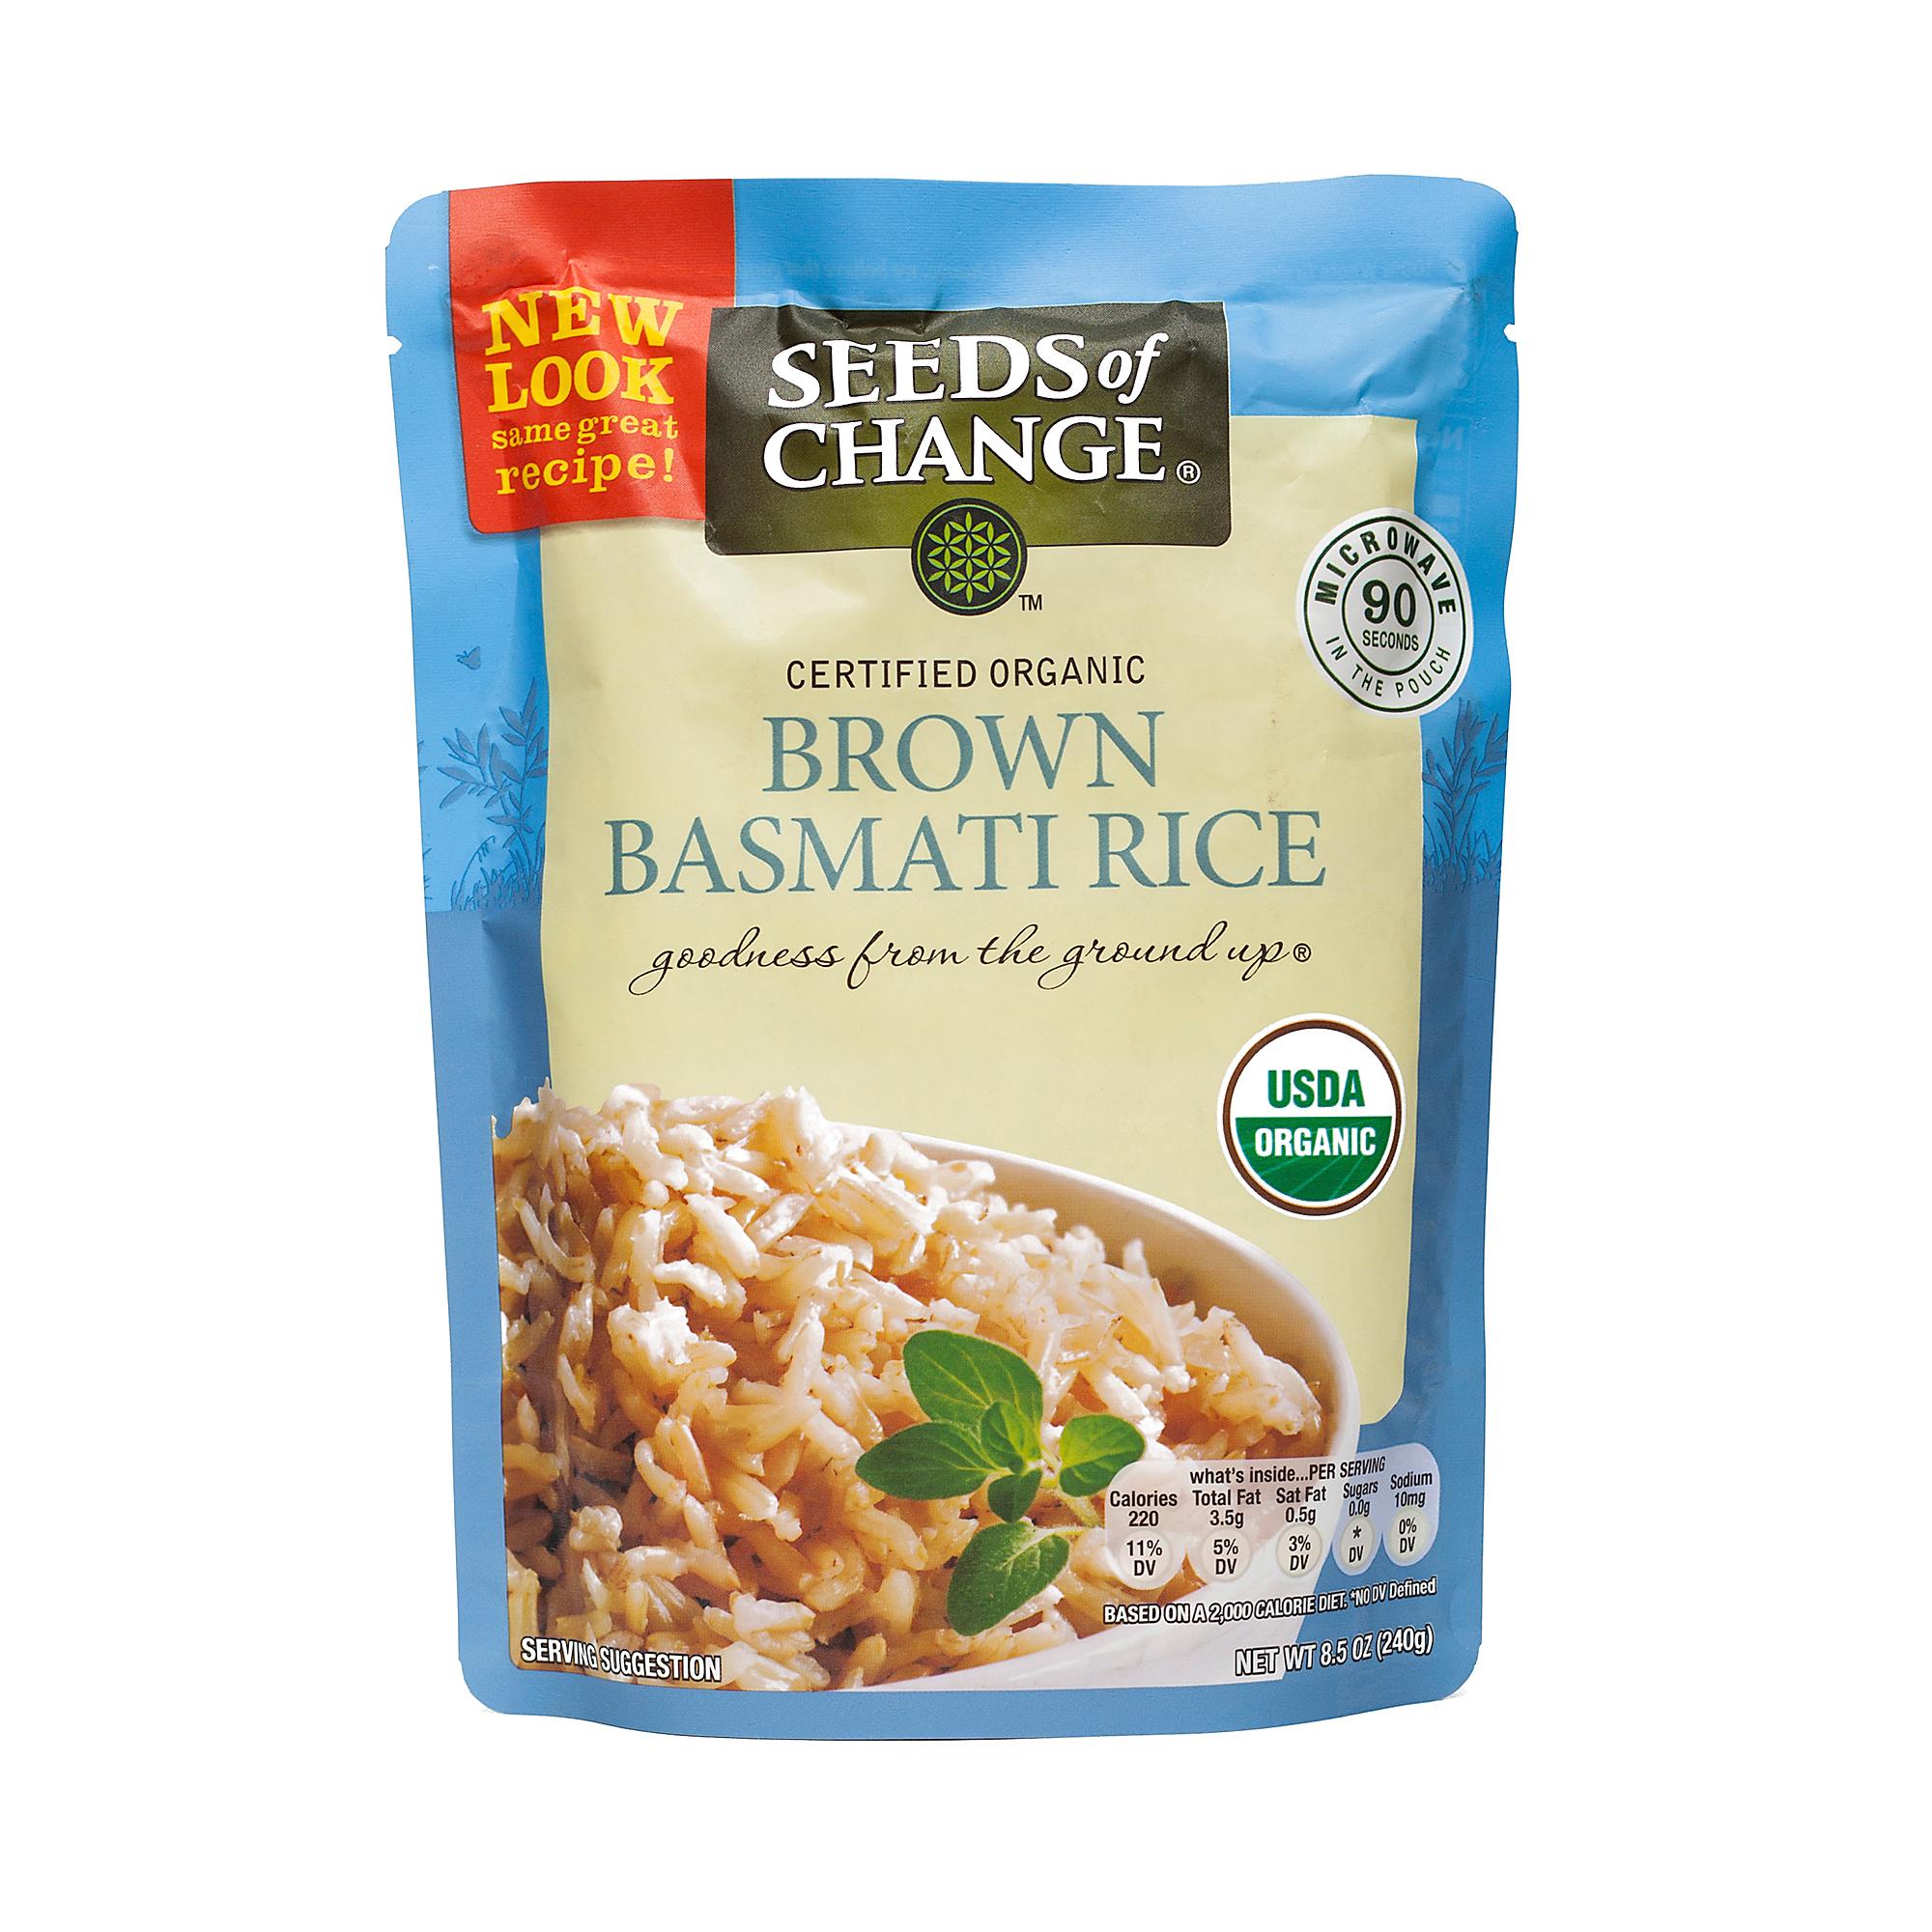 Seeds of Change Organic Brown Basmati Rice - Microwavable